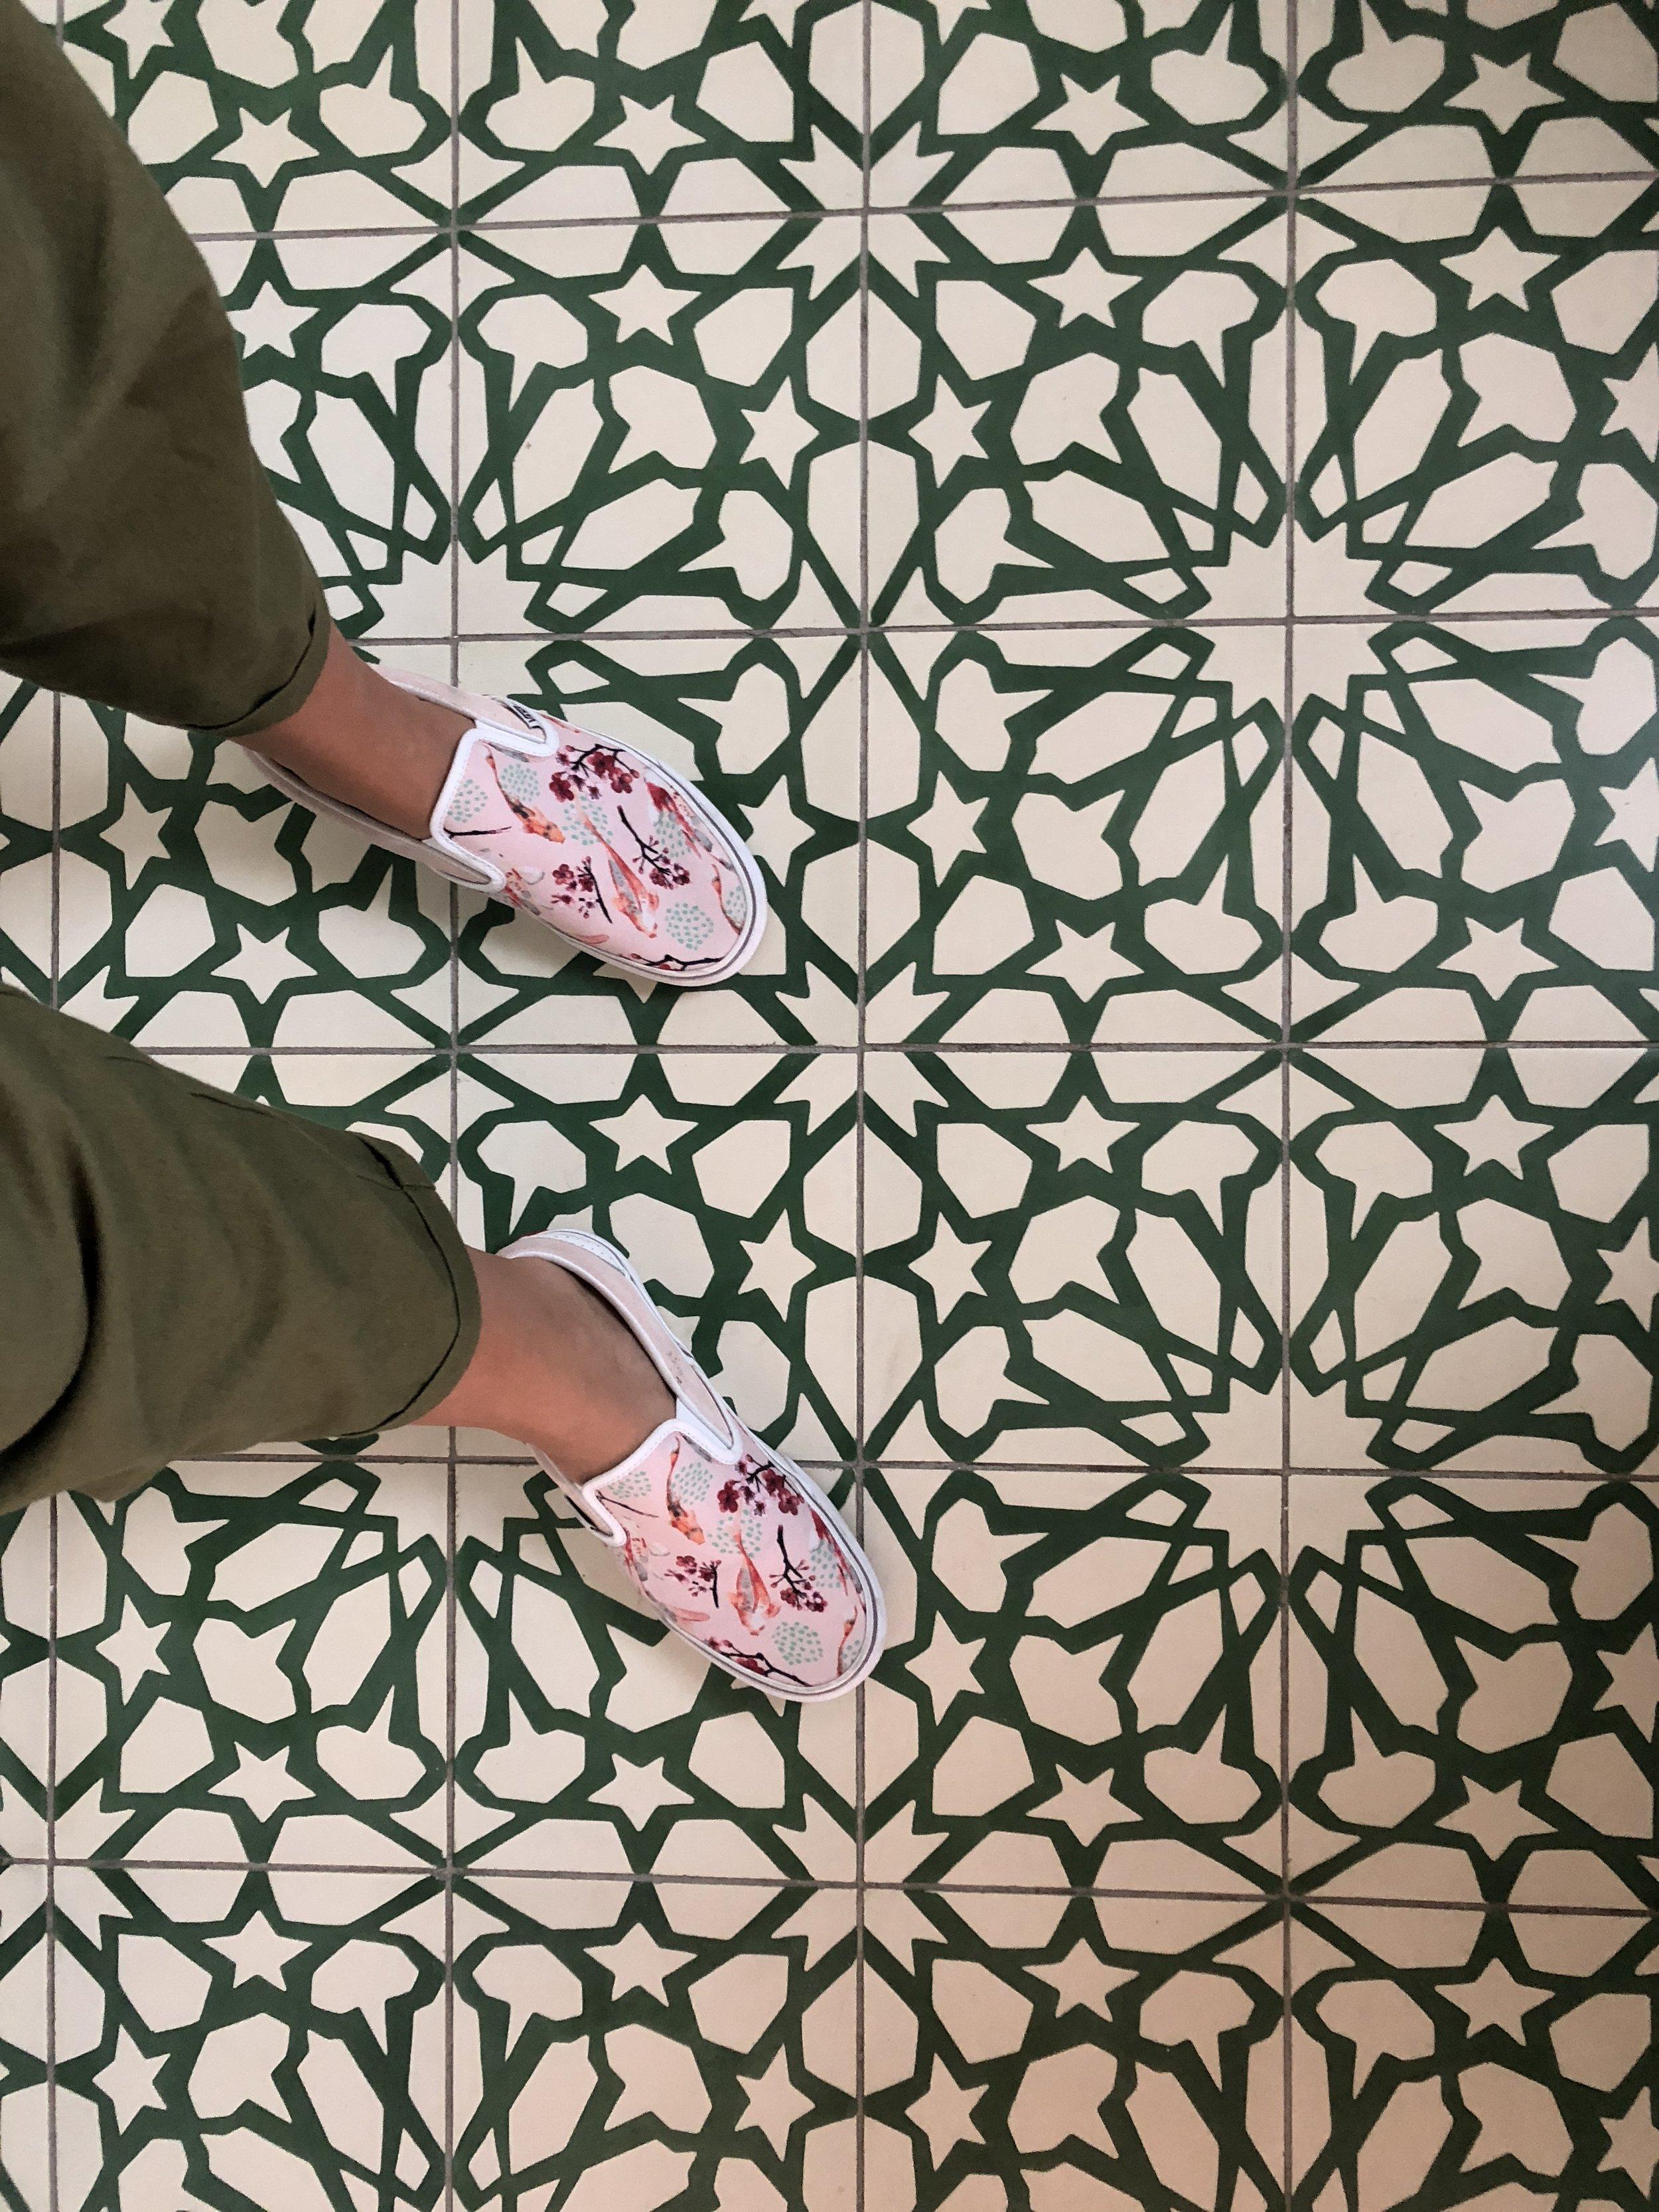 the room's bathroom tile